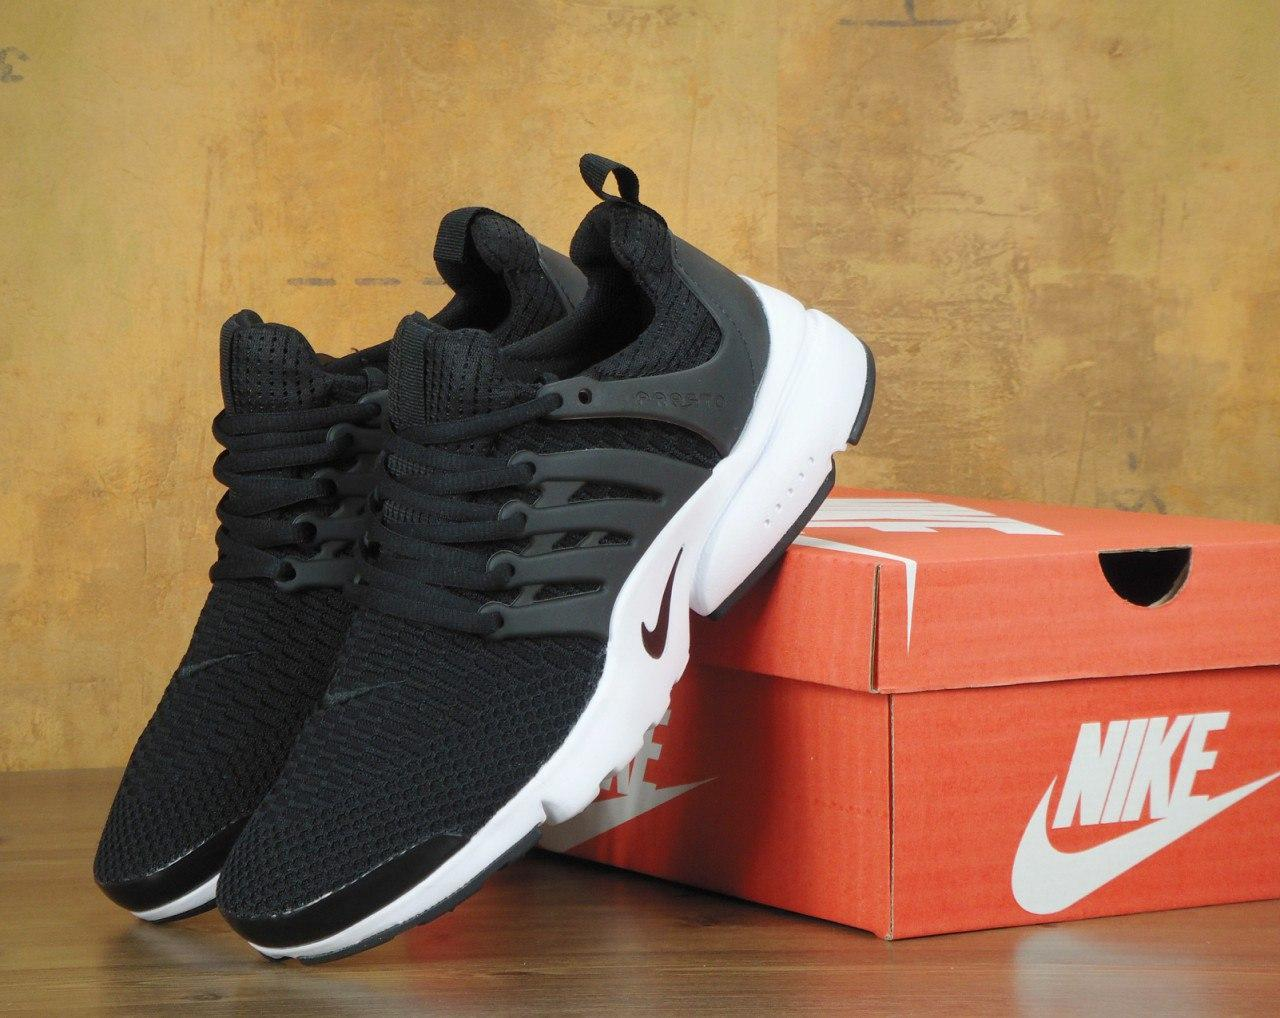 Кроссовки мужские Найк Nike  Air Presto Black/White. ТОП Реплика ААА класса.